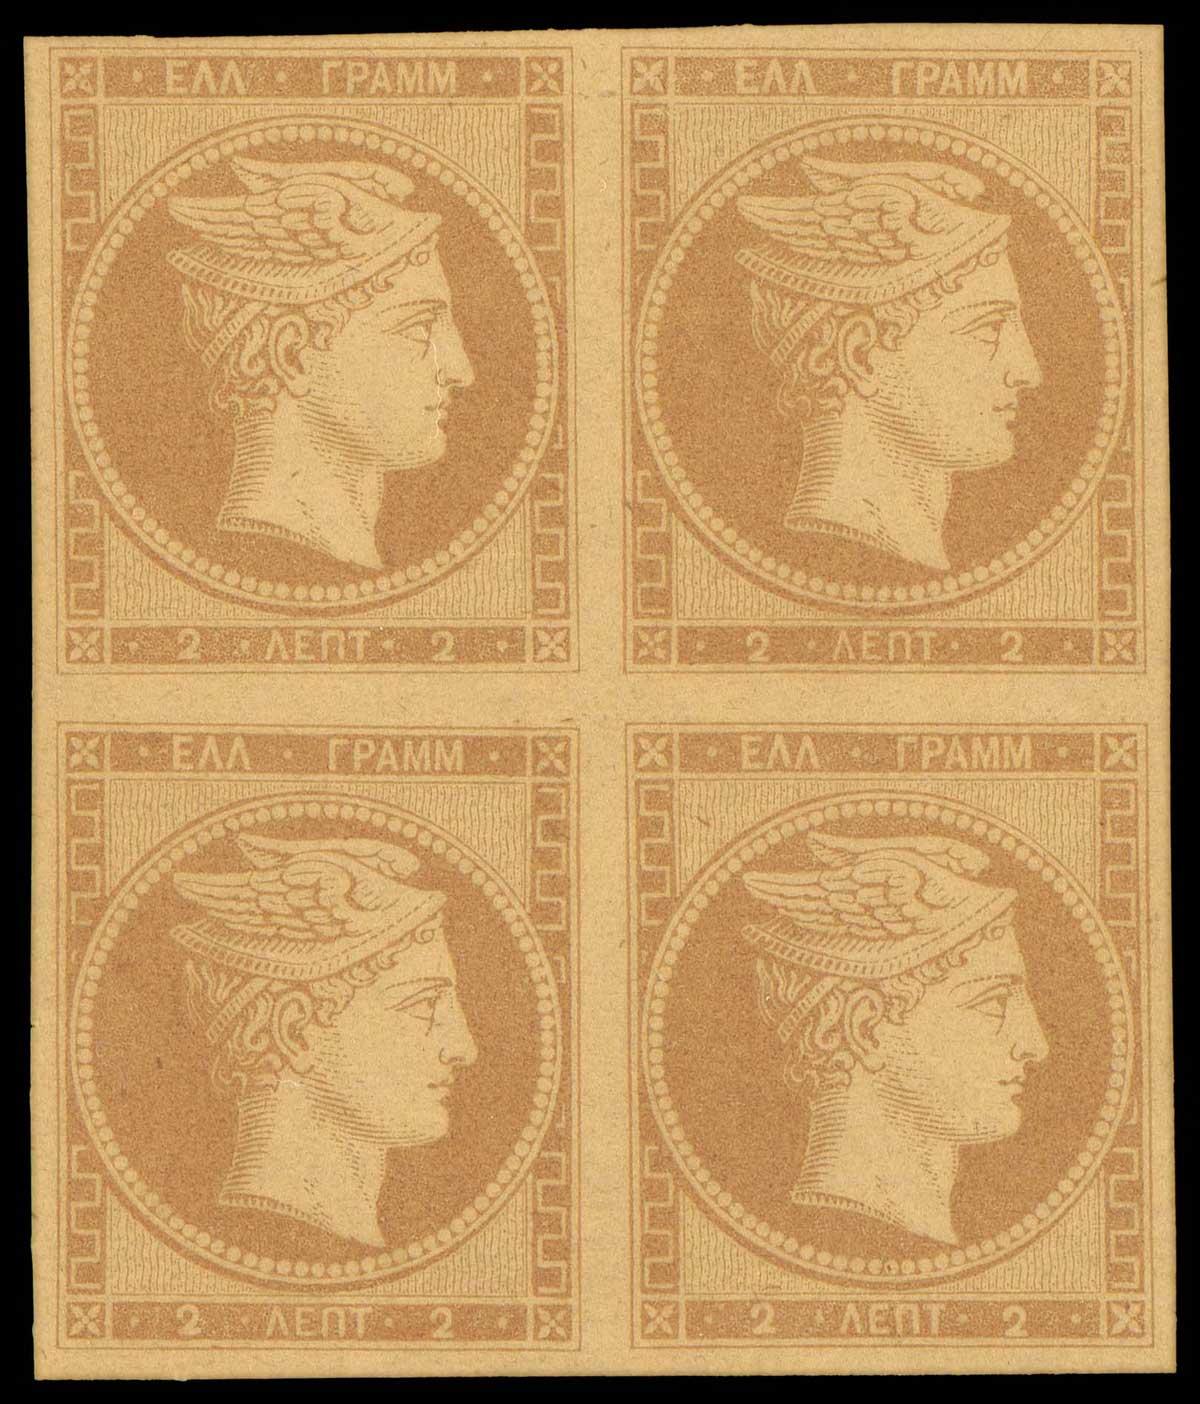 Lot 17 - GREECE-  LARGE HERMES HEAD 1861 paris print -  A. Karamitsos Public & LIVE Bid Auction 600 Coins, Medals & Banknotes